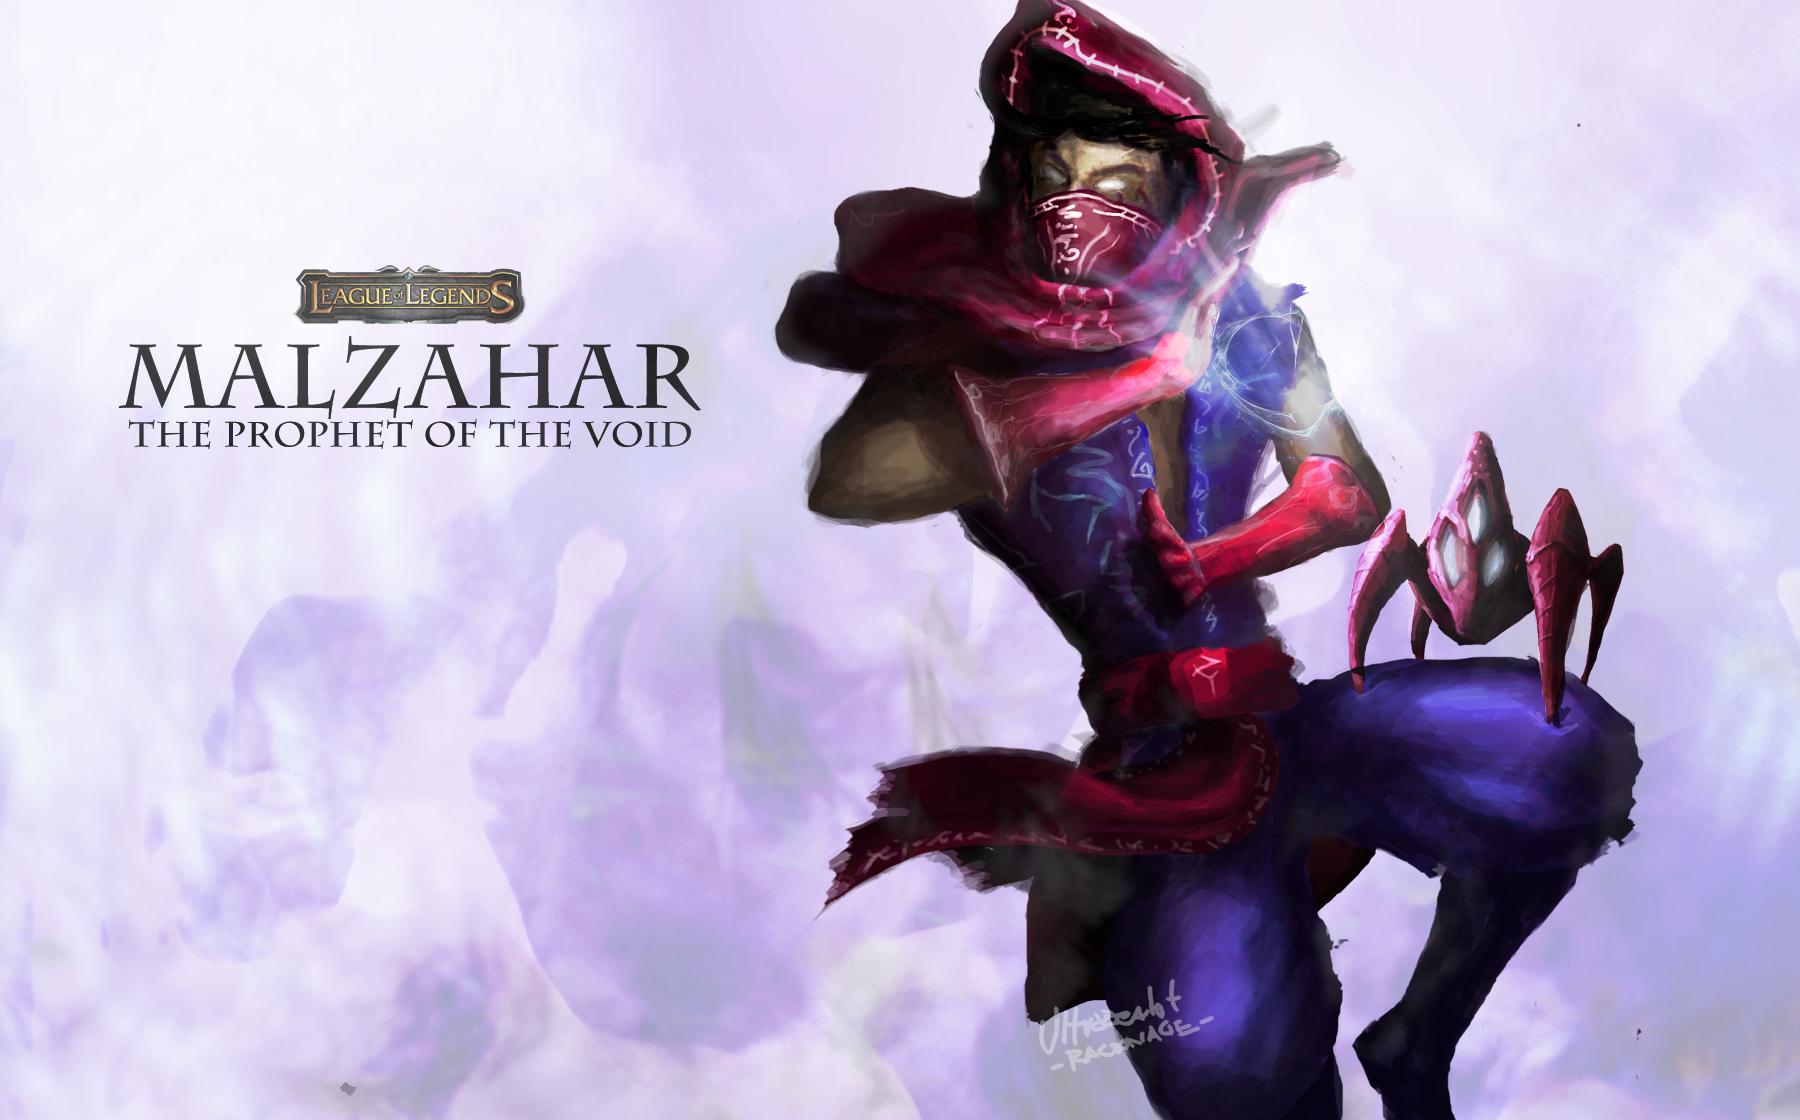 league of legends malzahar - photo #25